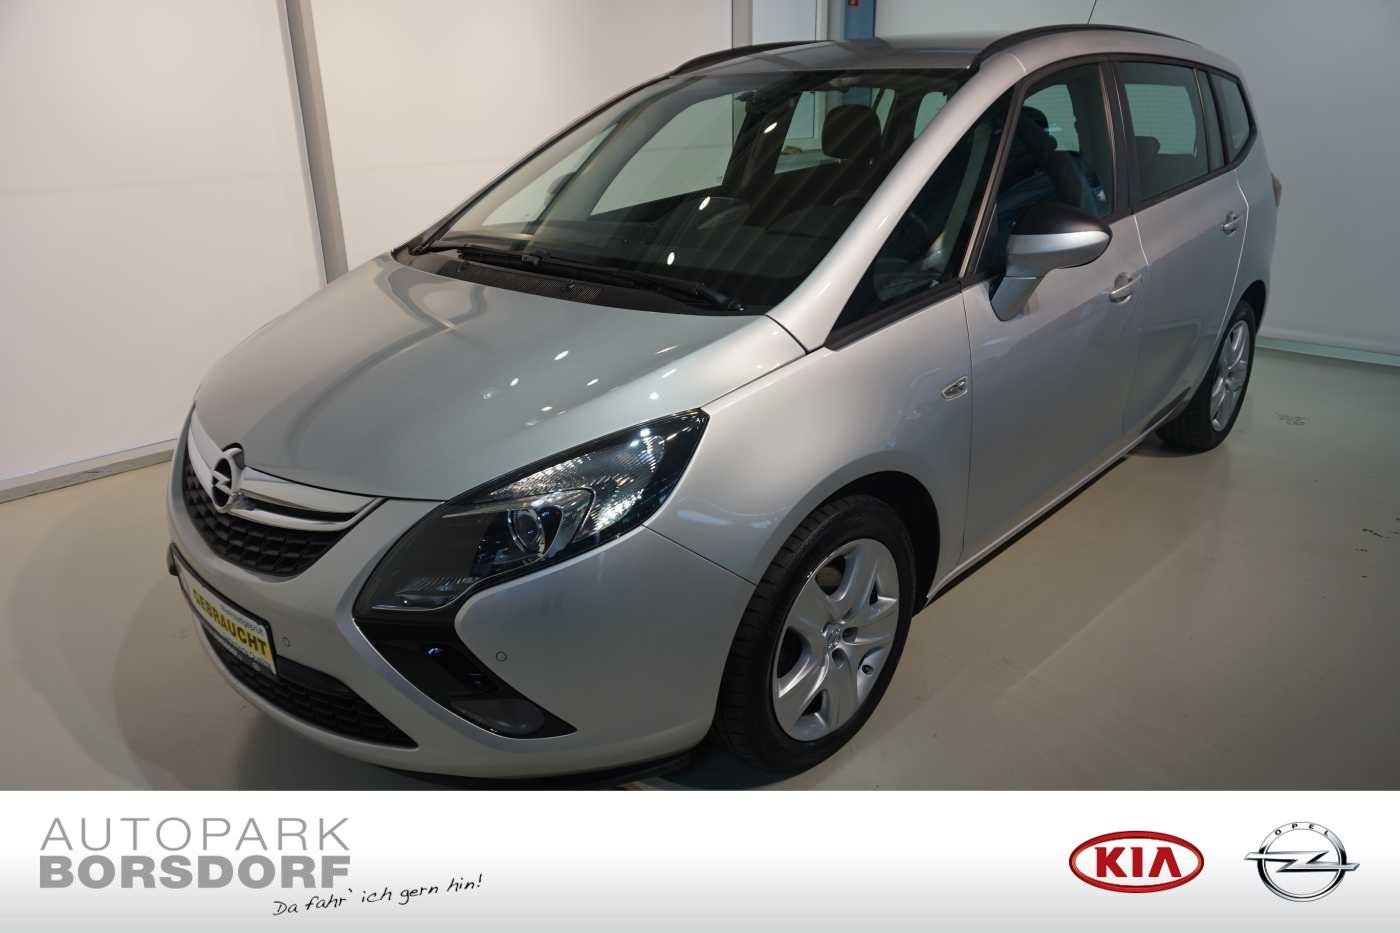 Opel Zafira Tourer 1.6 CDTI Edit. Klimaautomatik PDC, Jahr 2016, Diesel